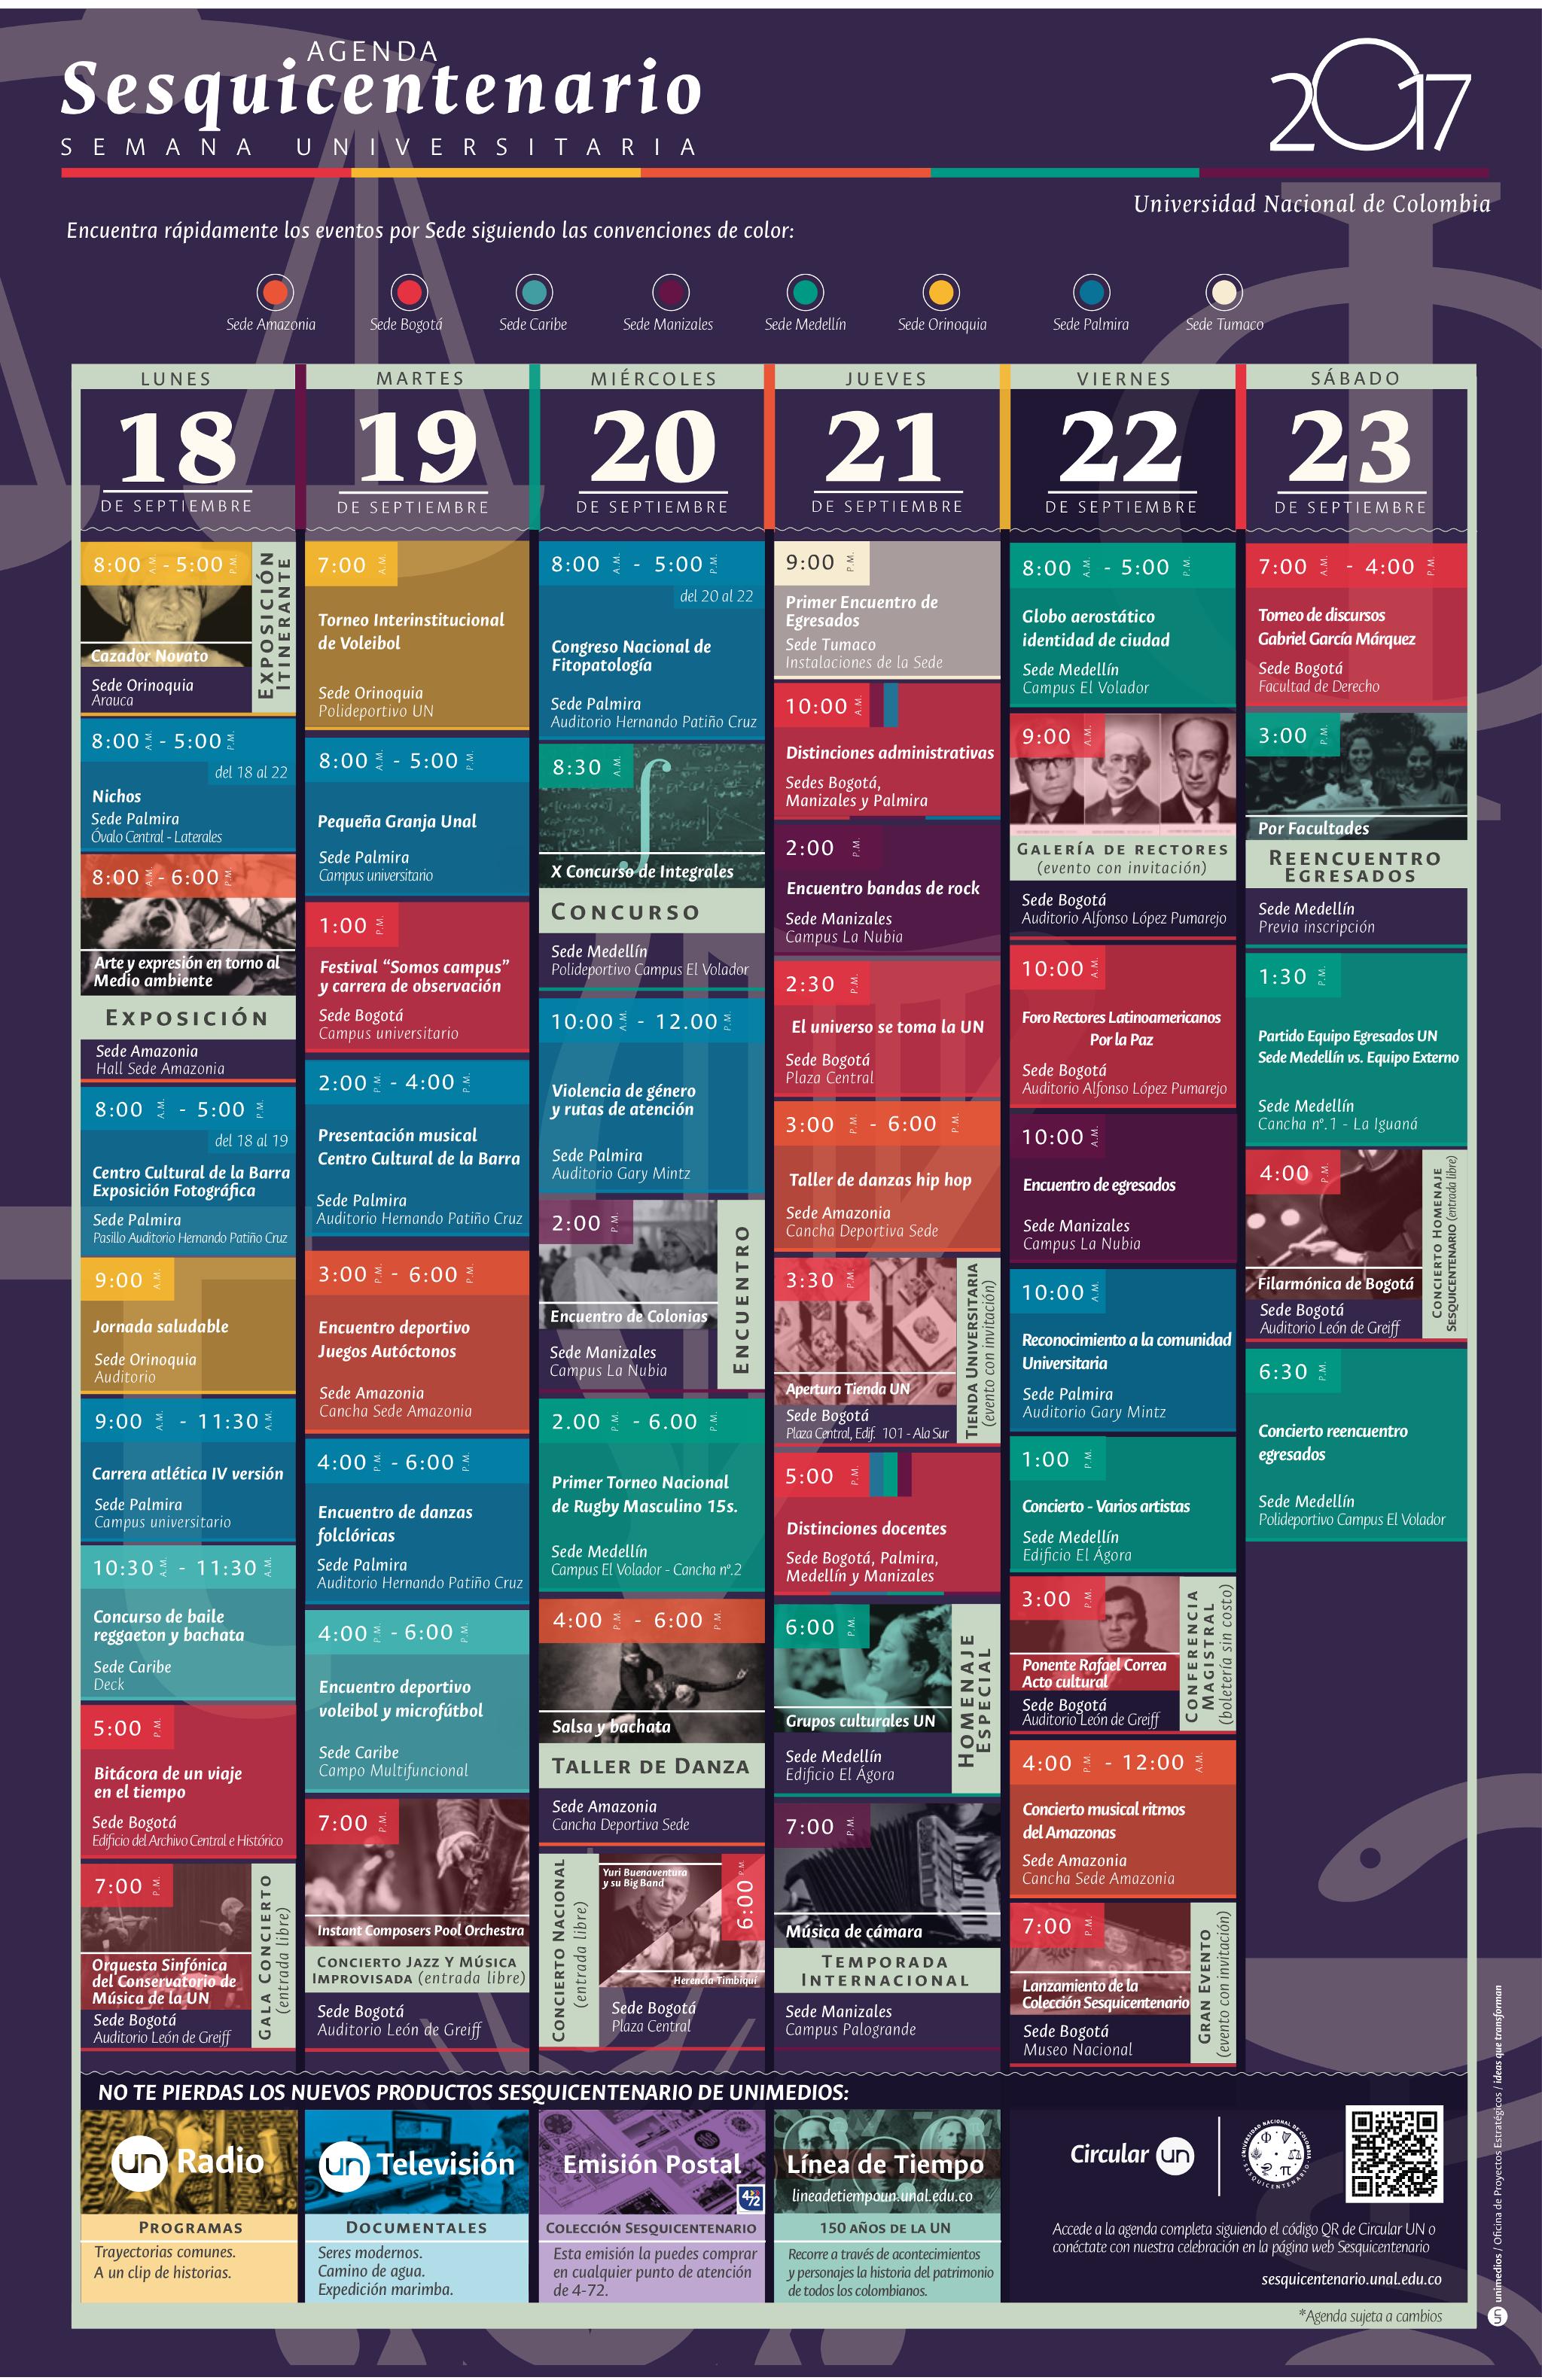 Agenda Semana Universitaria 2017